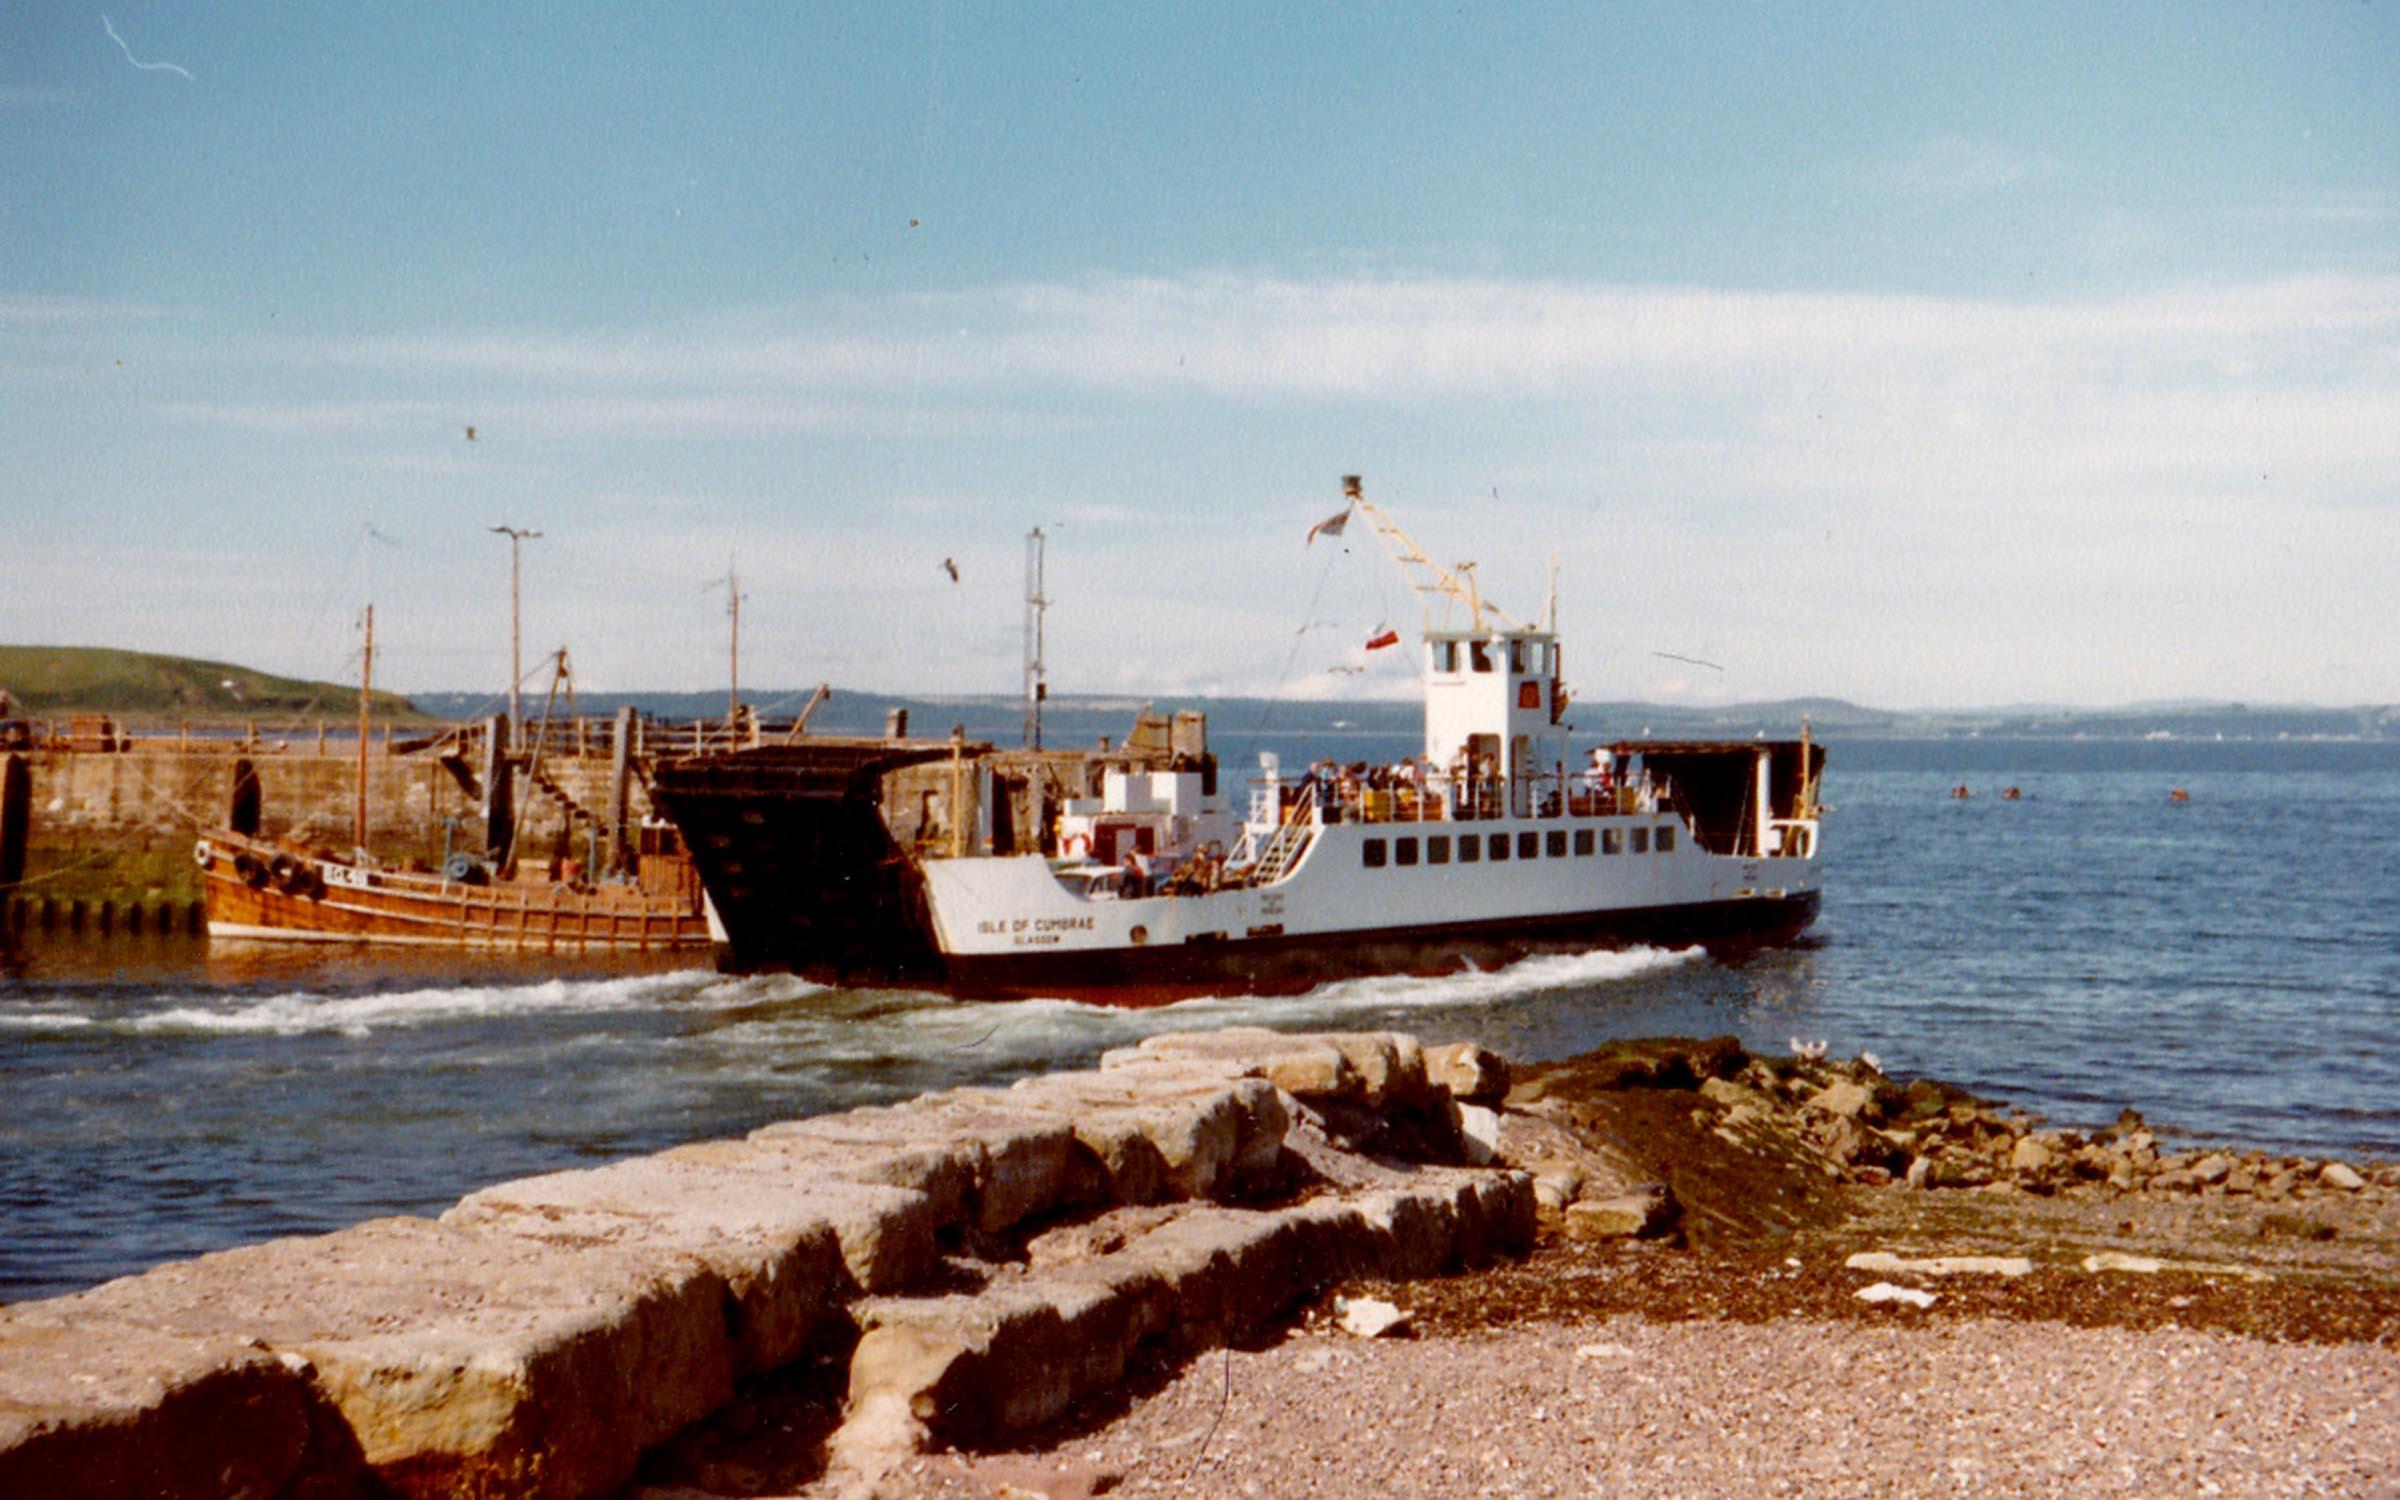 Isle of Cumbrae leaving Largs (Jim Aikman Smith)